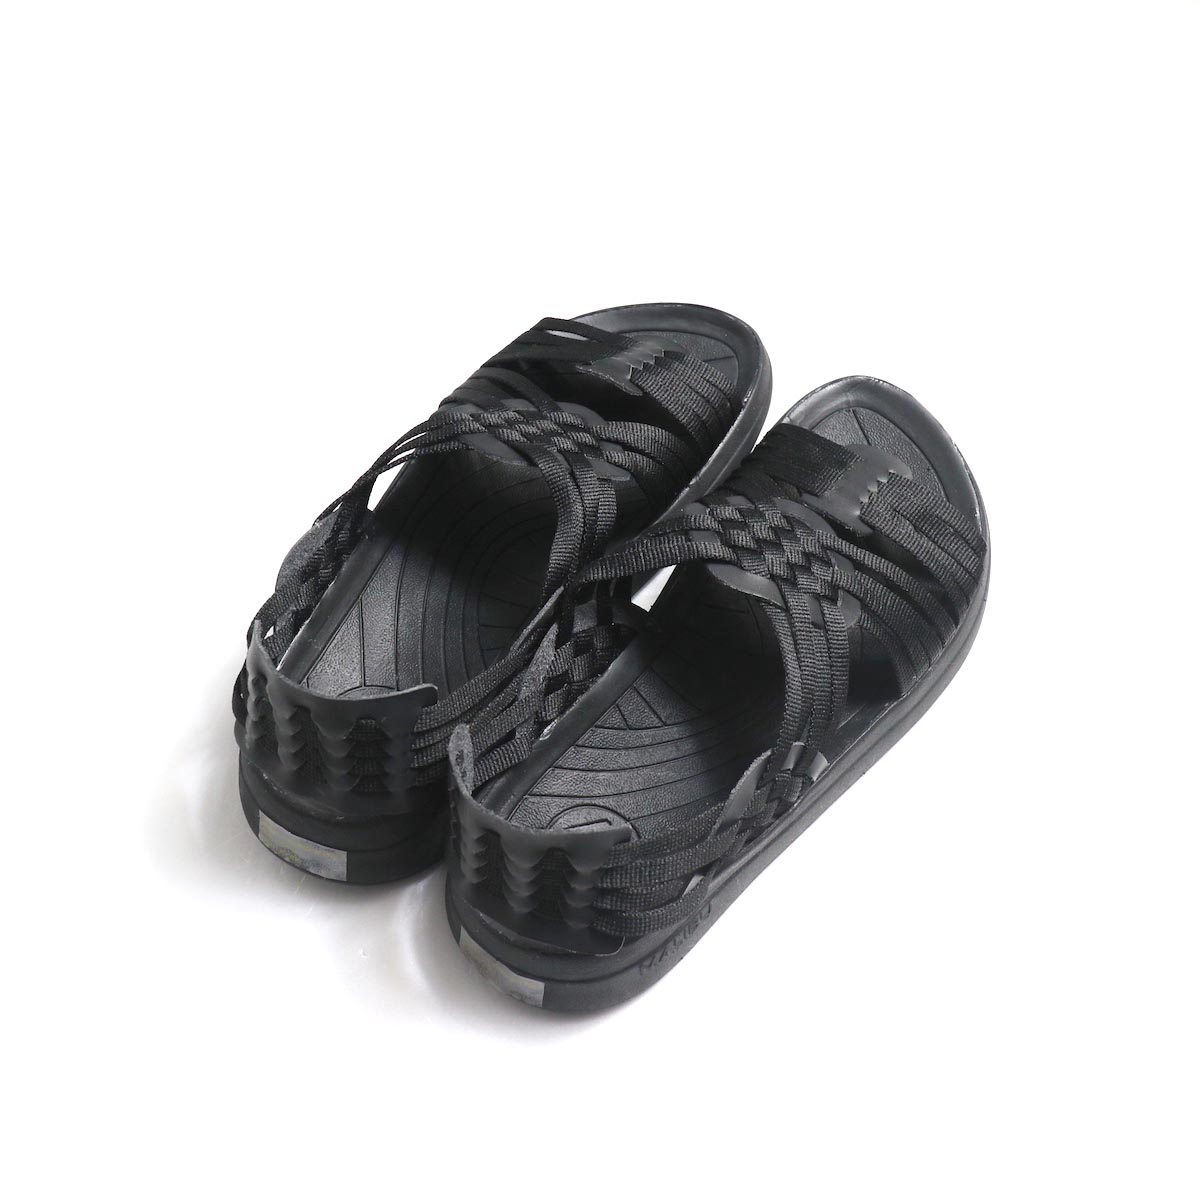 Malibu Sandals / Canyon (Nylon Weave) -Black 背面